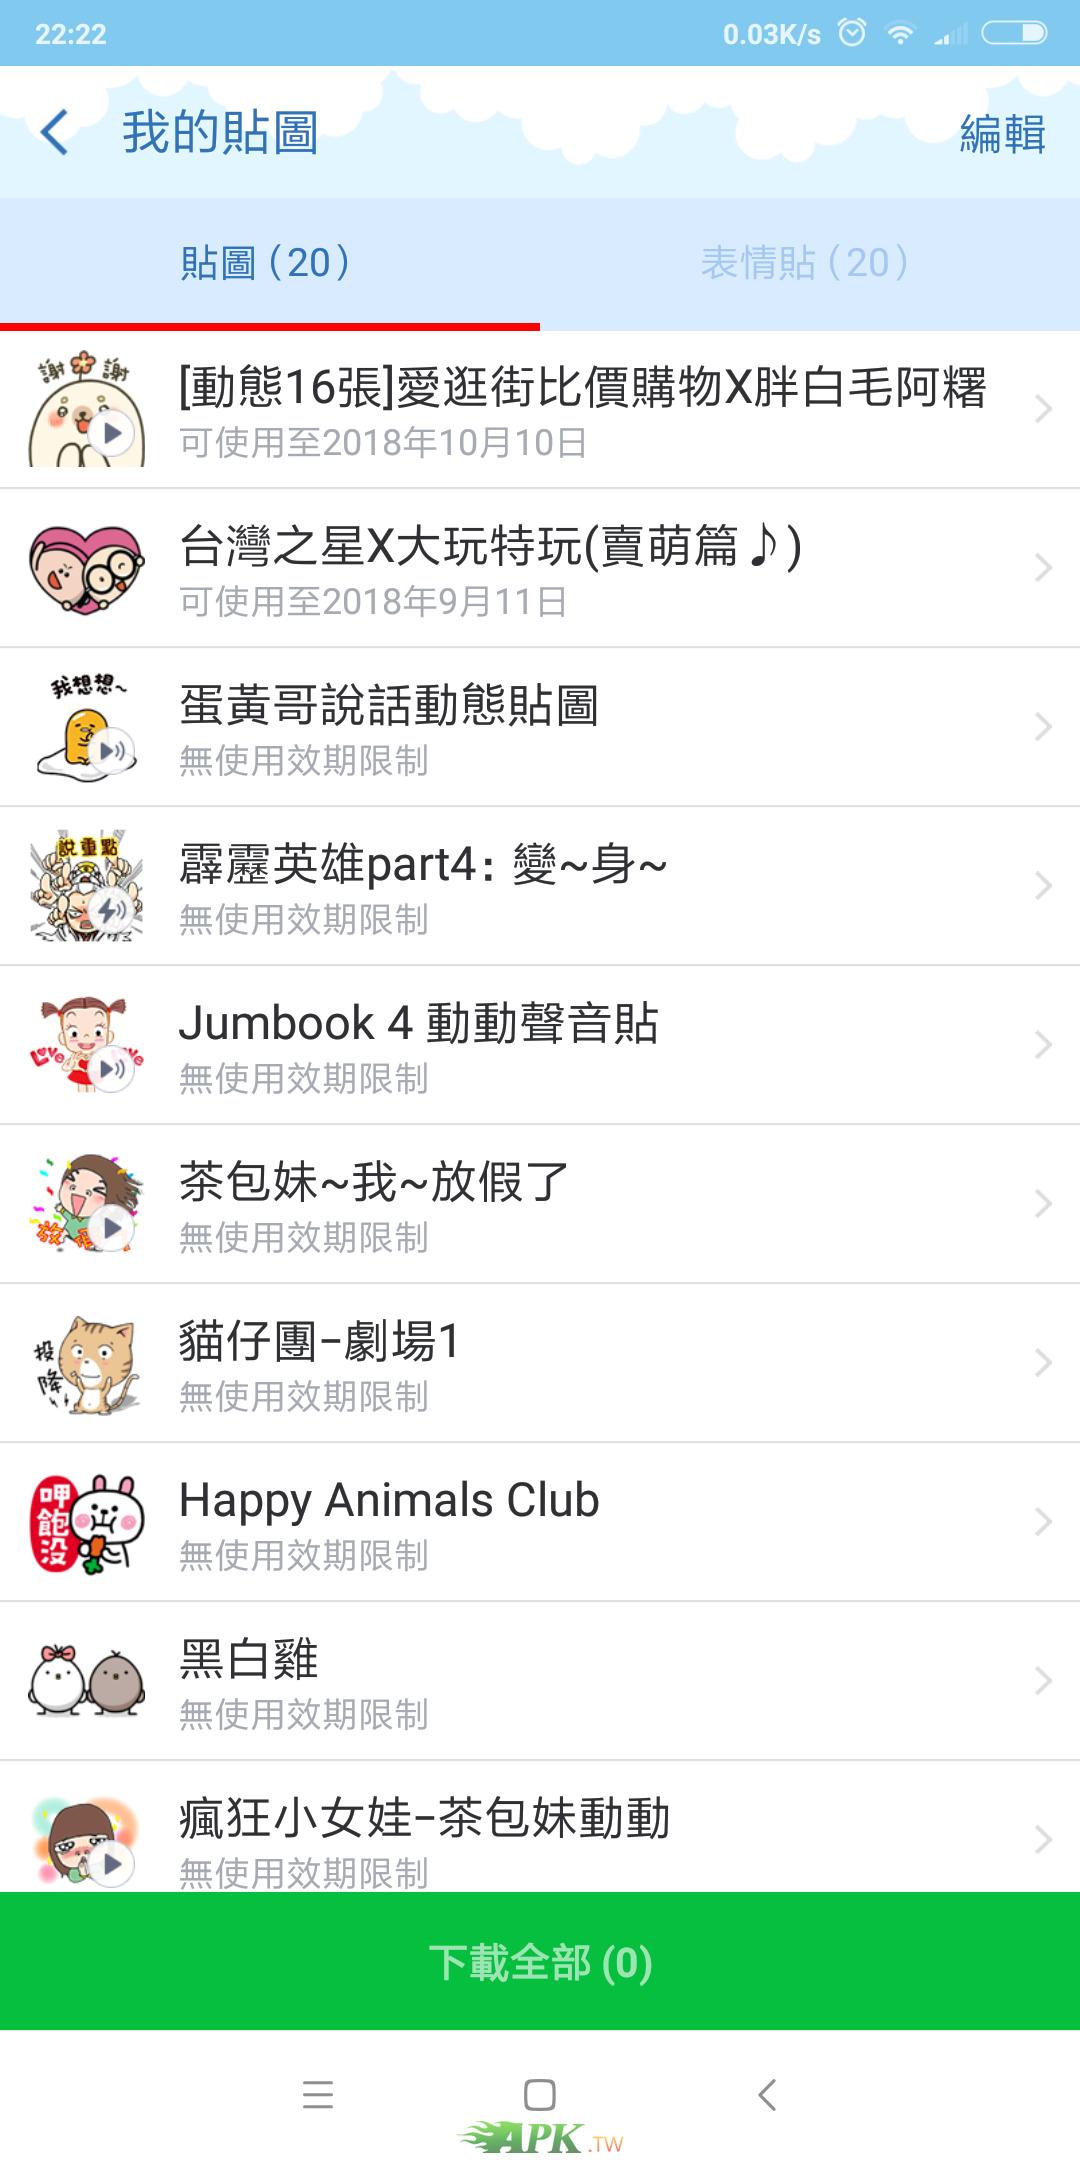 Screenshot_2018-07-30-22-22-17-650_jp.naver.line.android.png